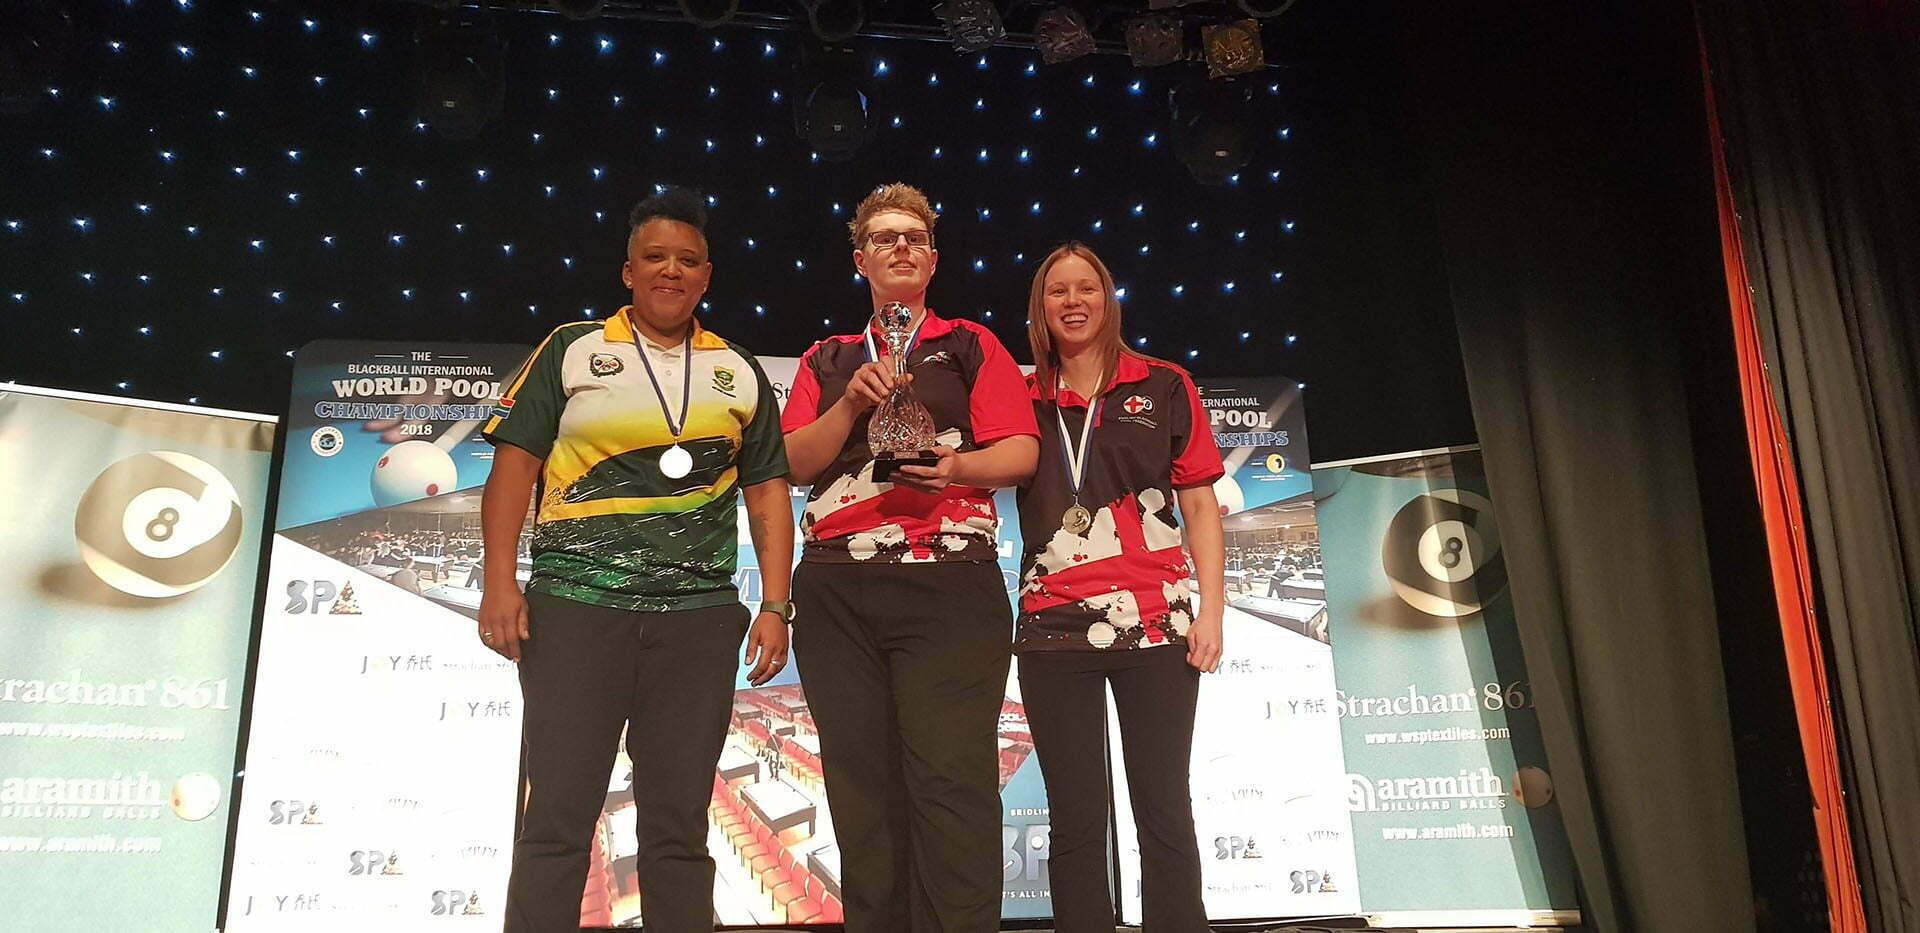 Ash is England Ladies's World Pool Champion